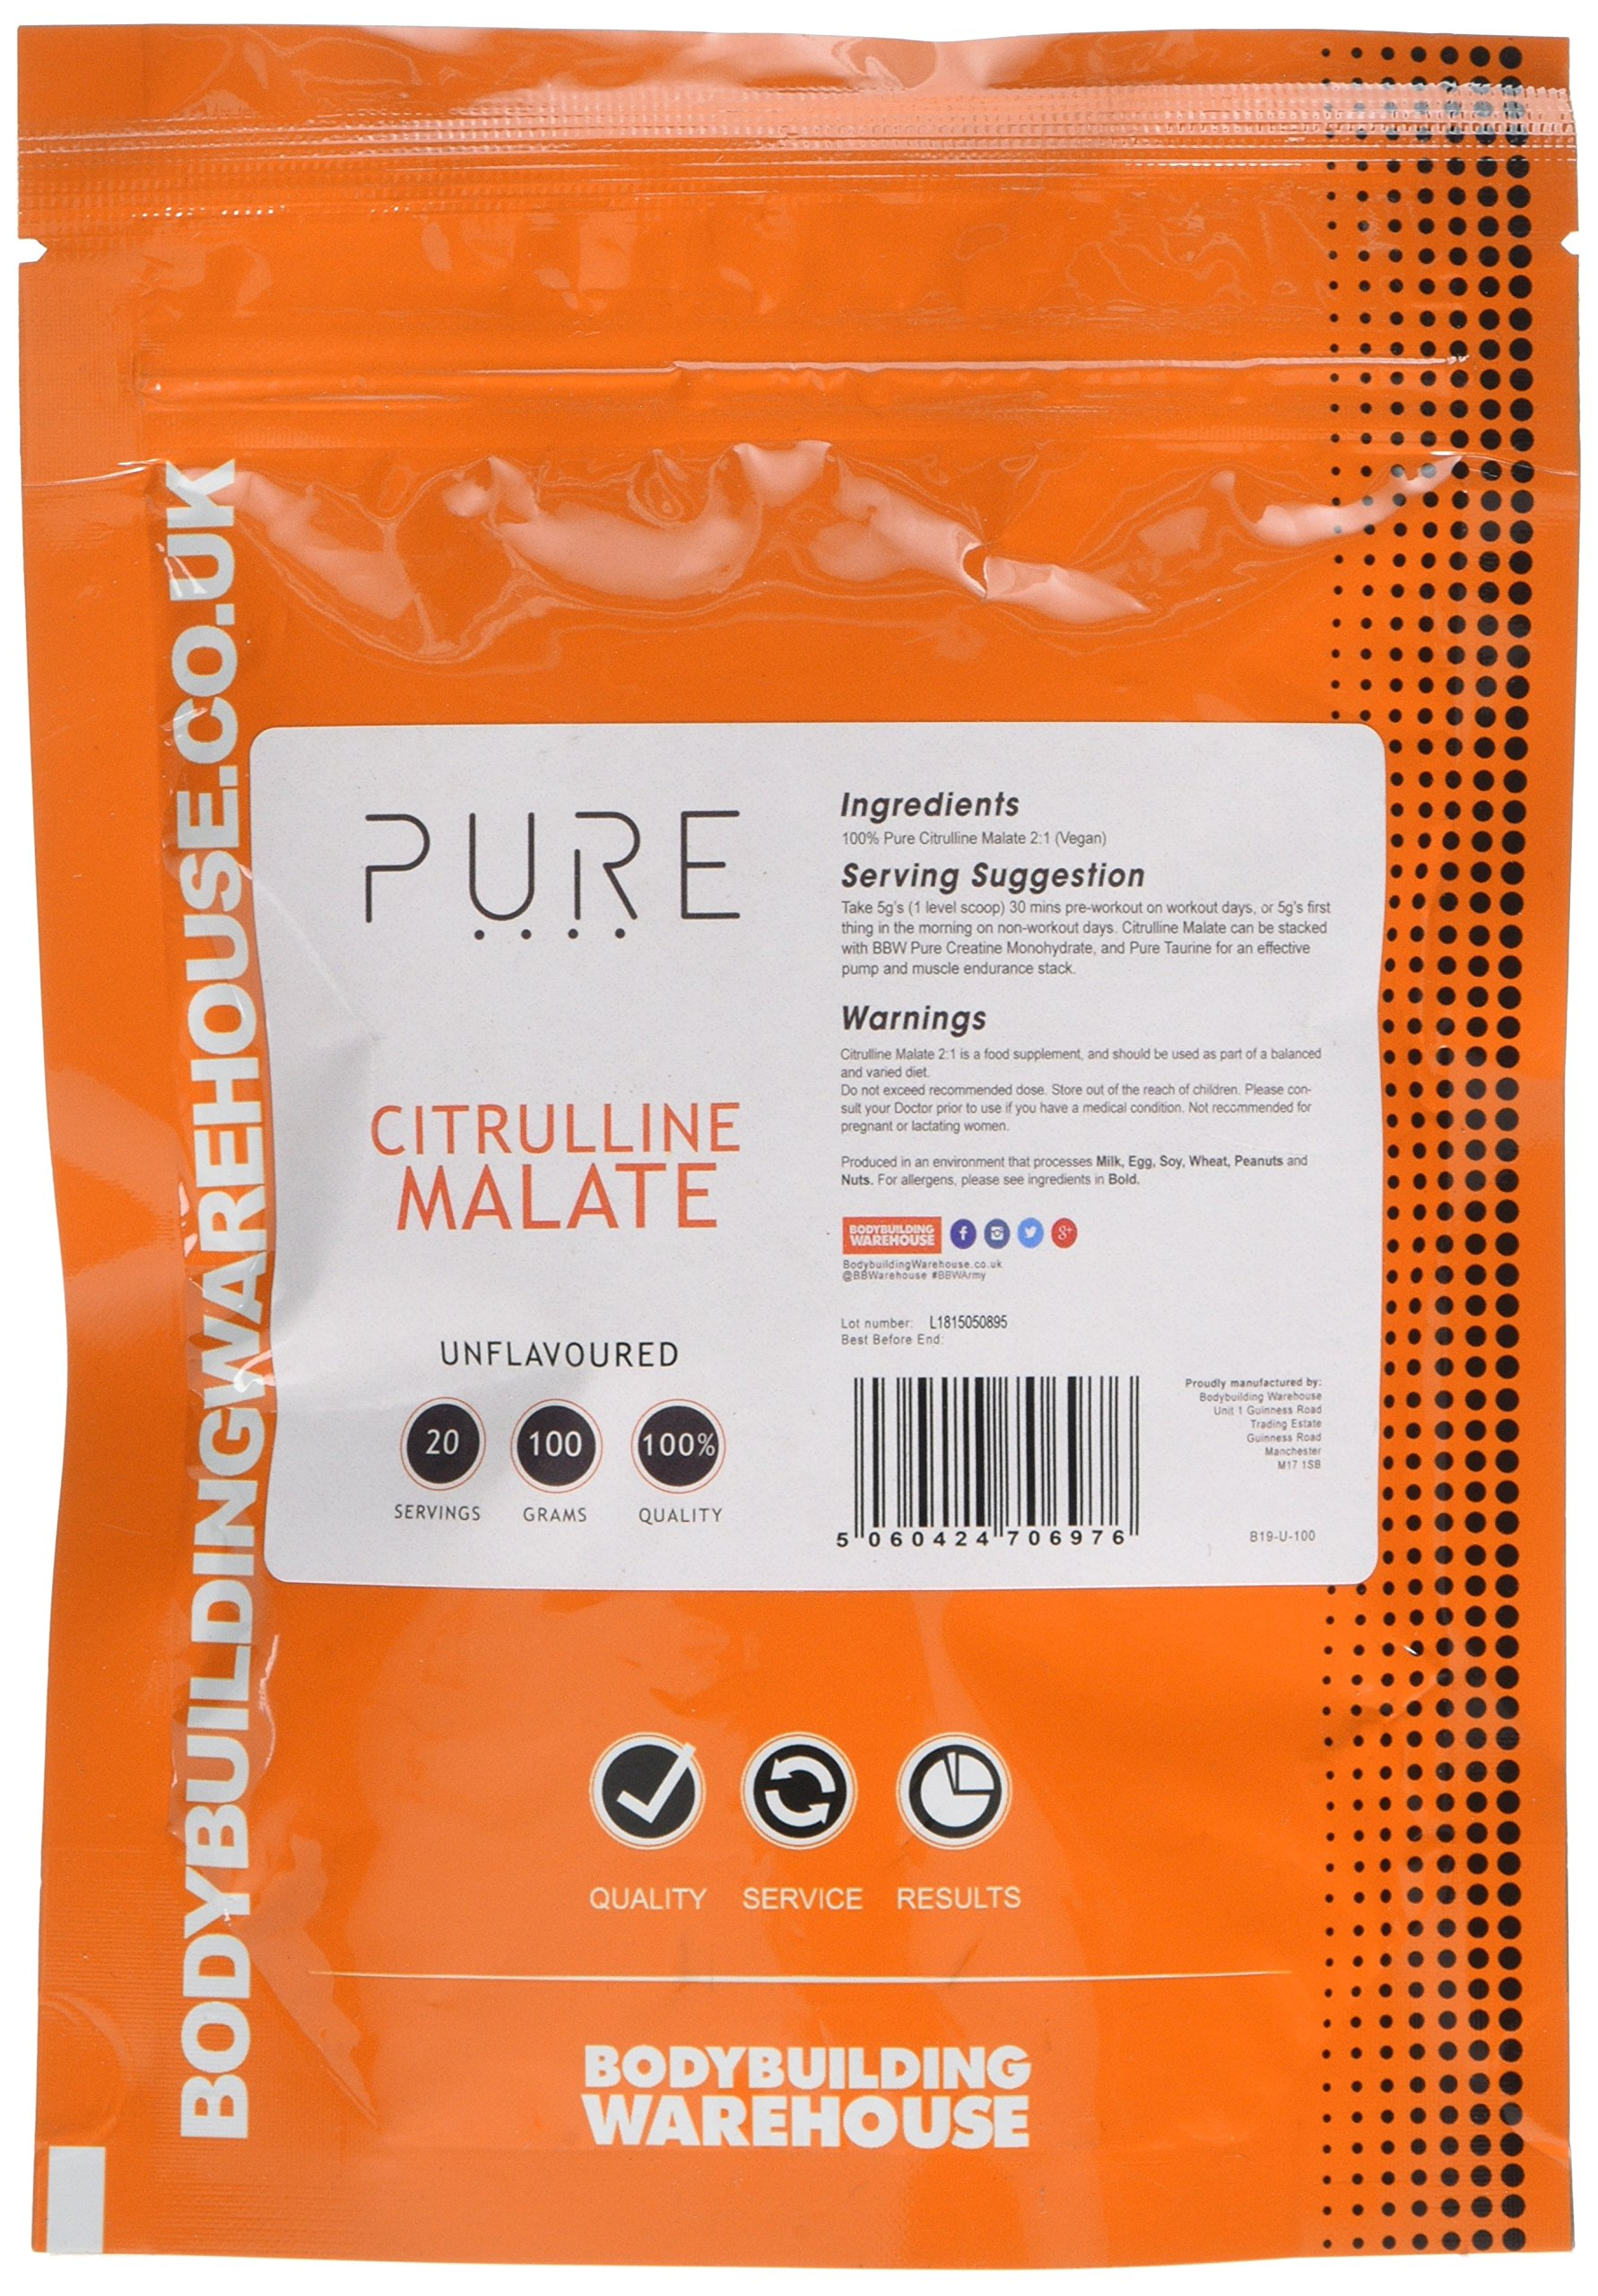 91%2BEM5ZpQEL - Bodybuilding Warehouse Pure Citrulline Malate Powder Unflavoured